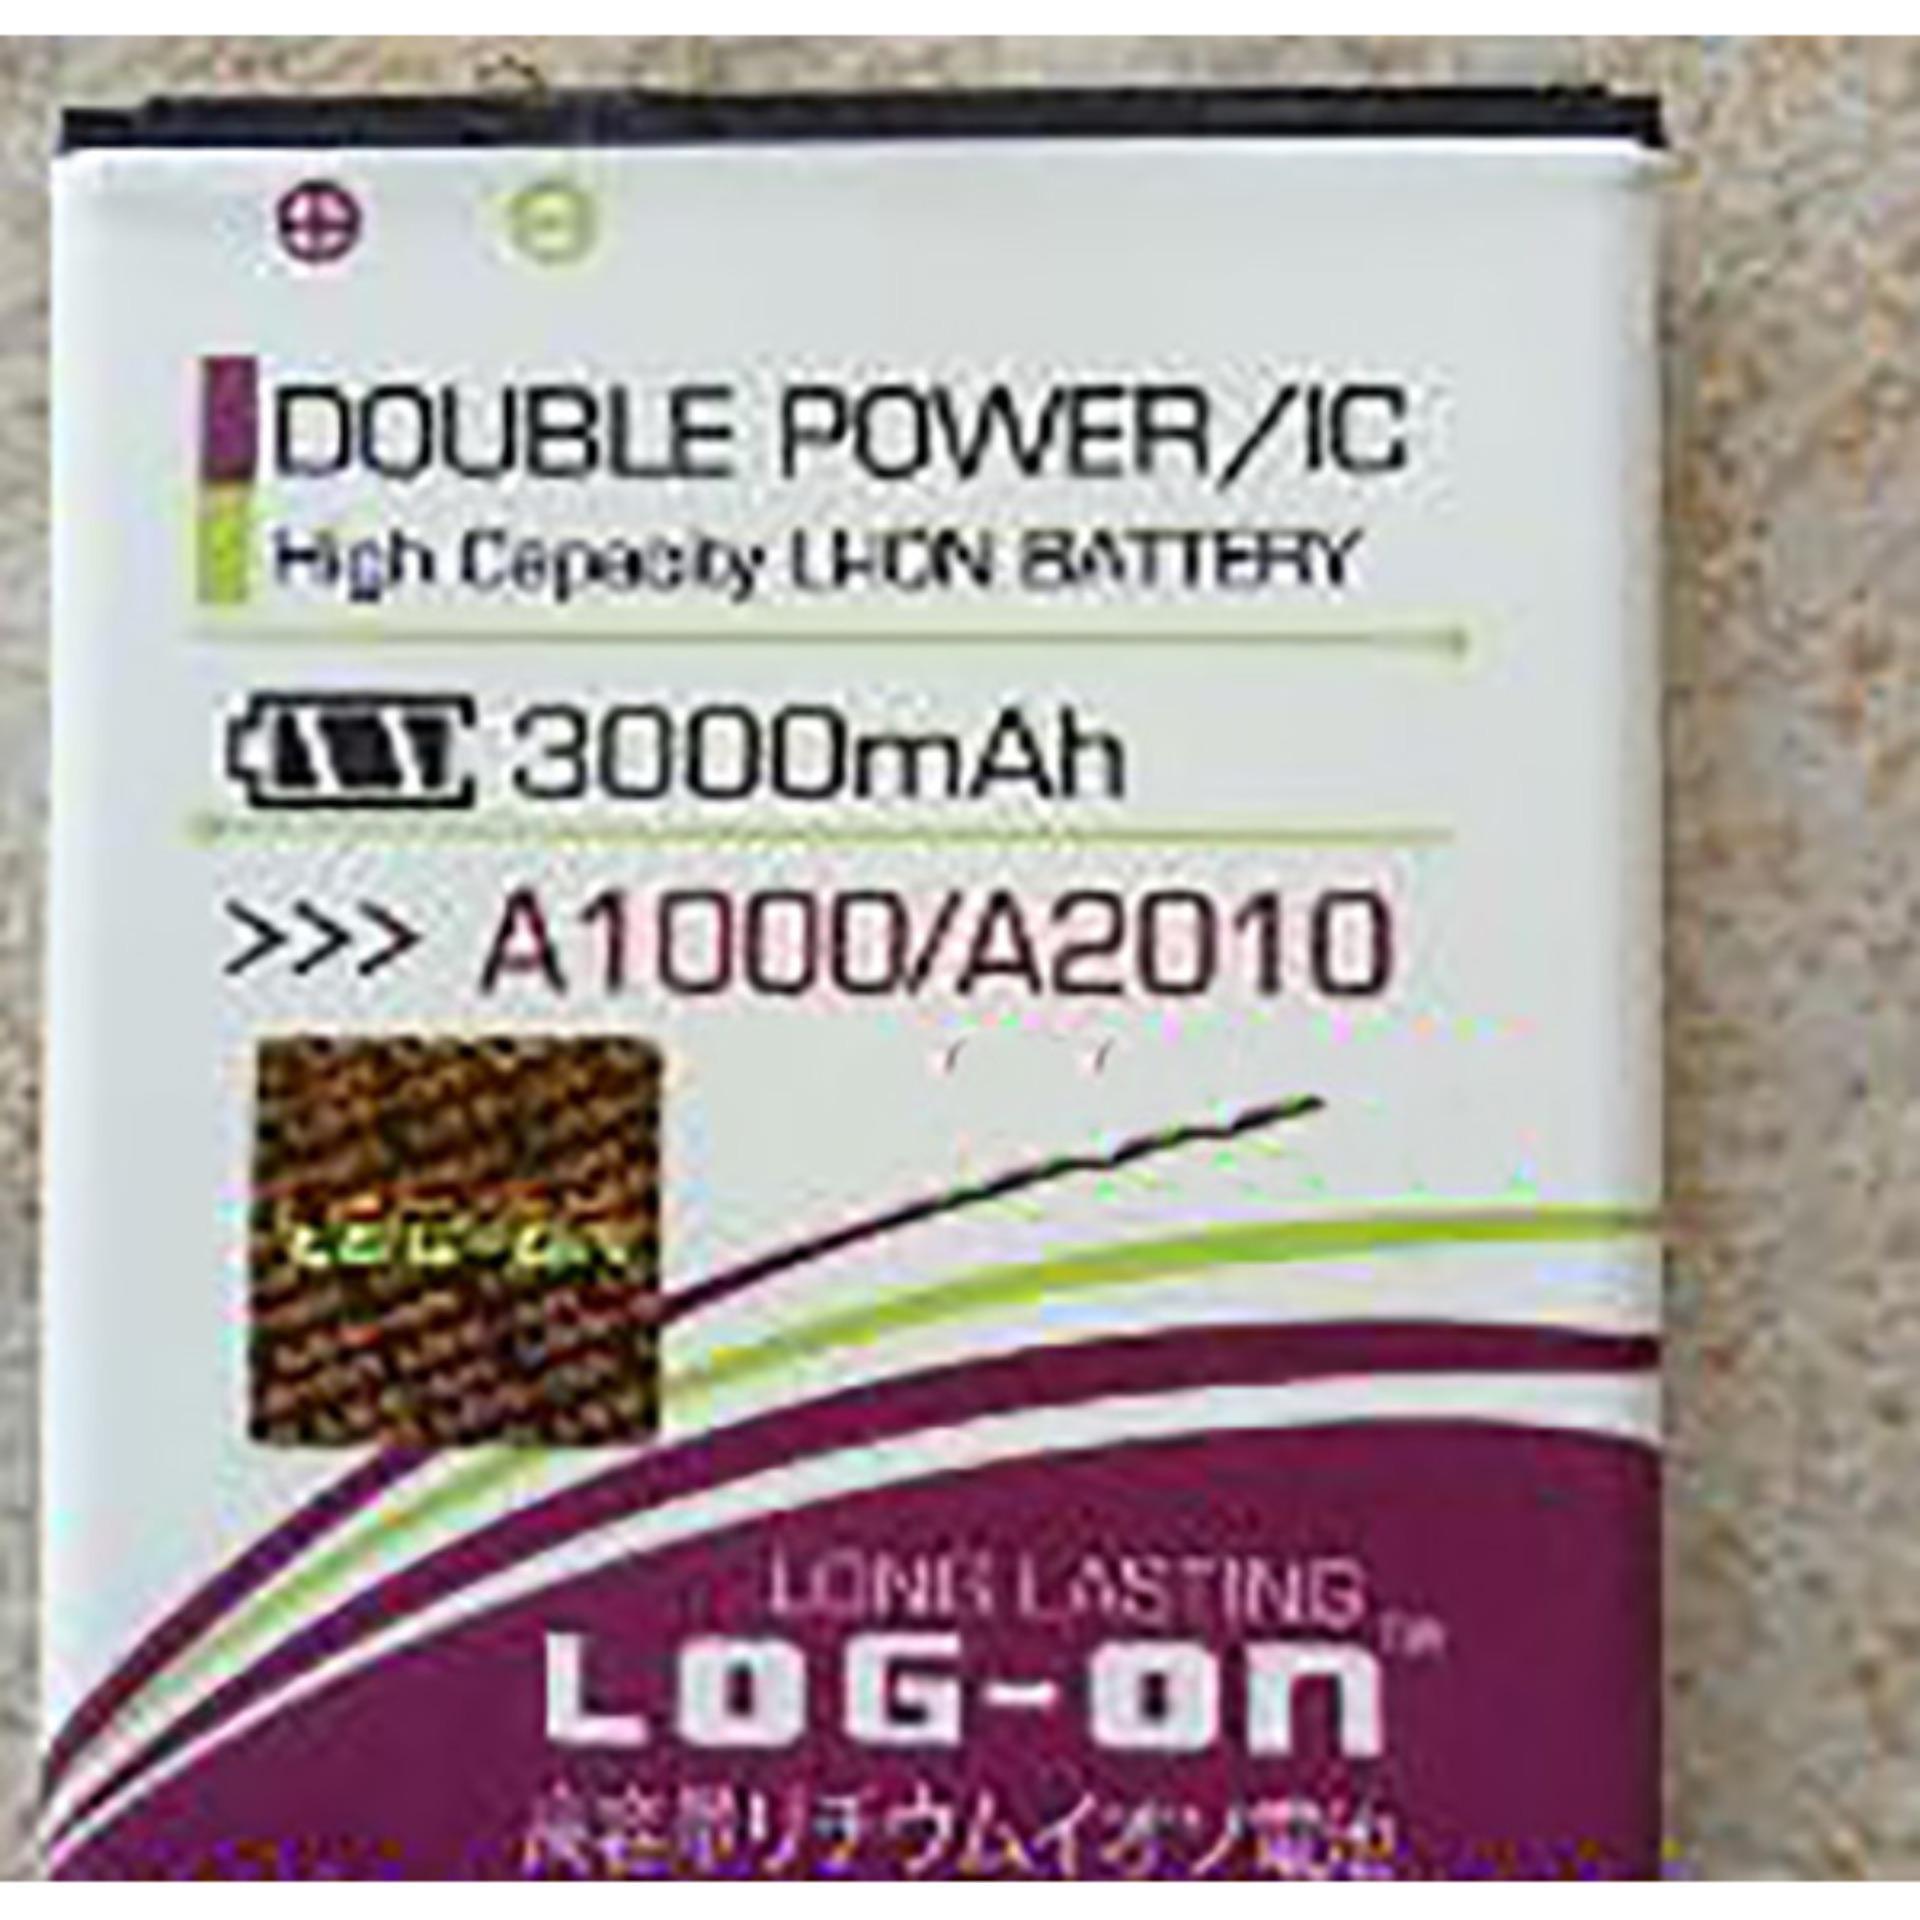 Harga Penawaran LOG-ON Battery For Lenovo A1000 / A2010